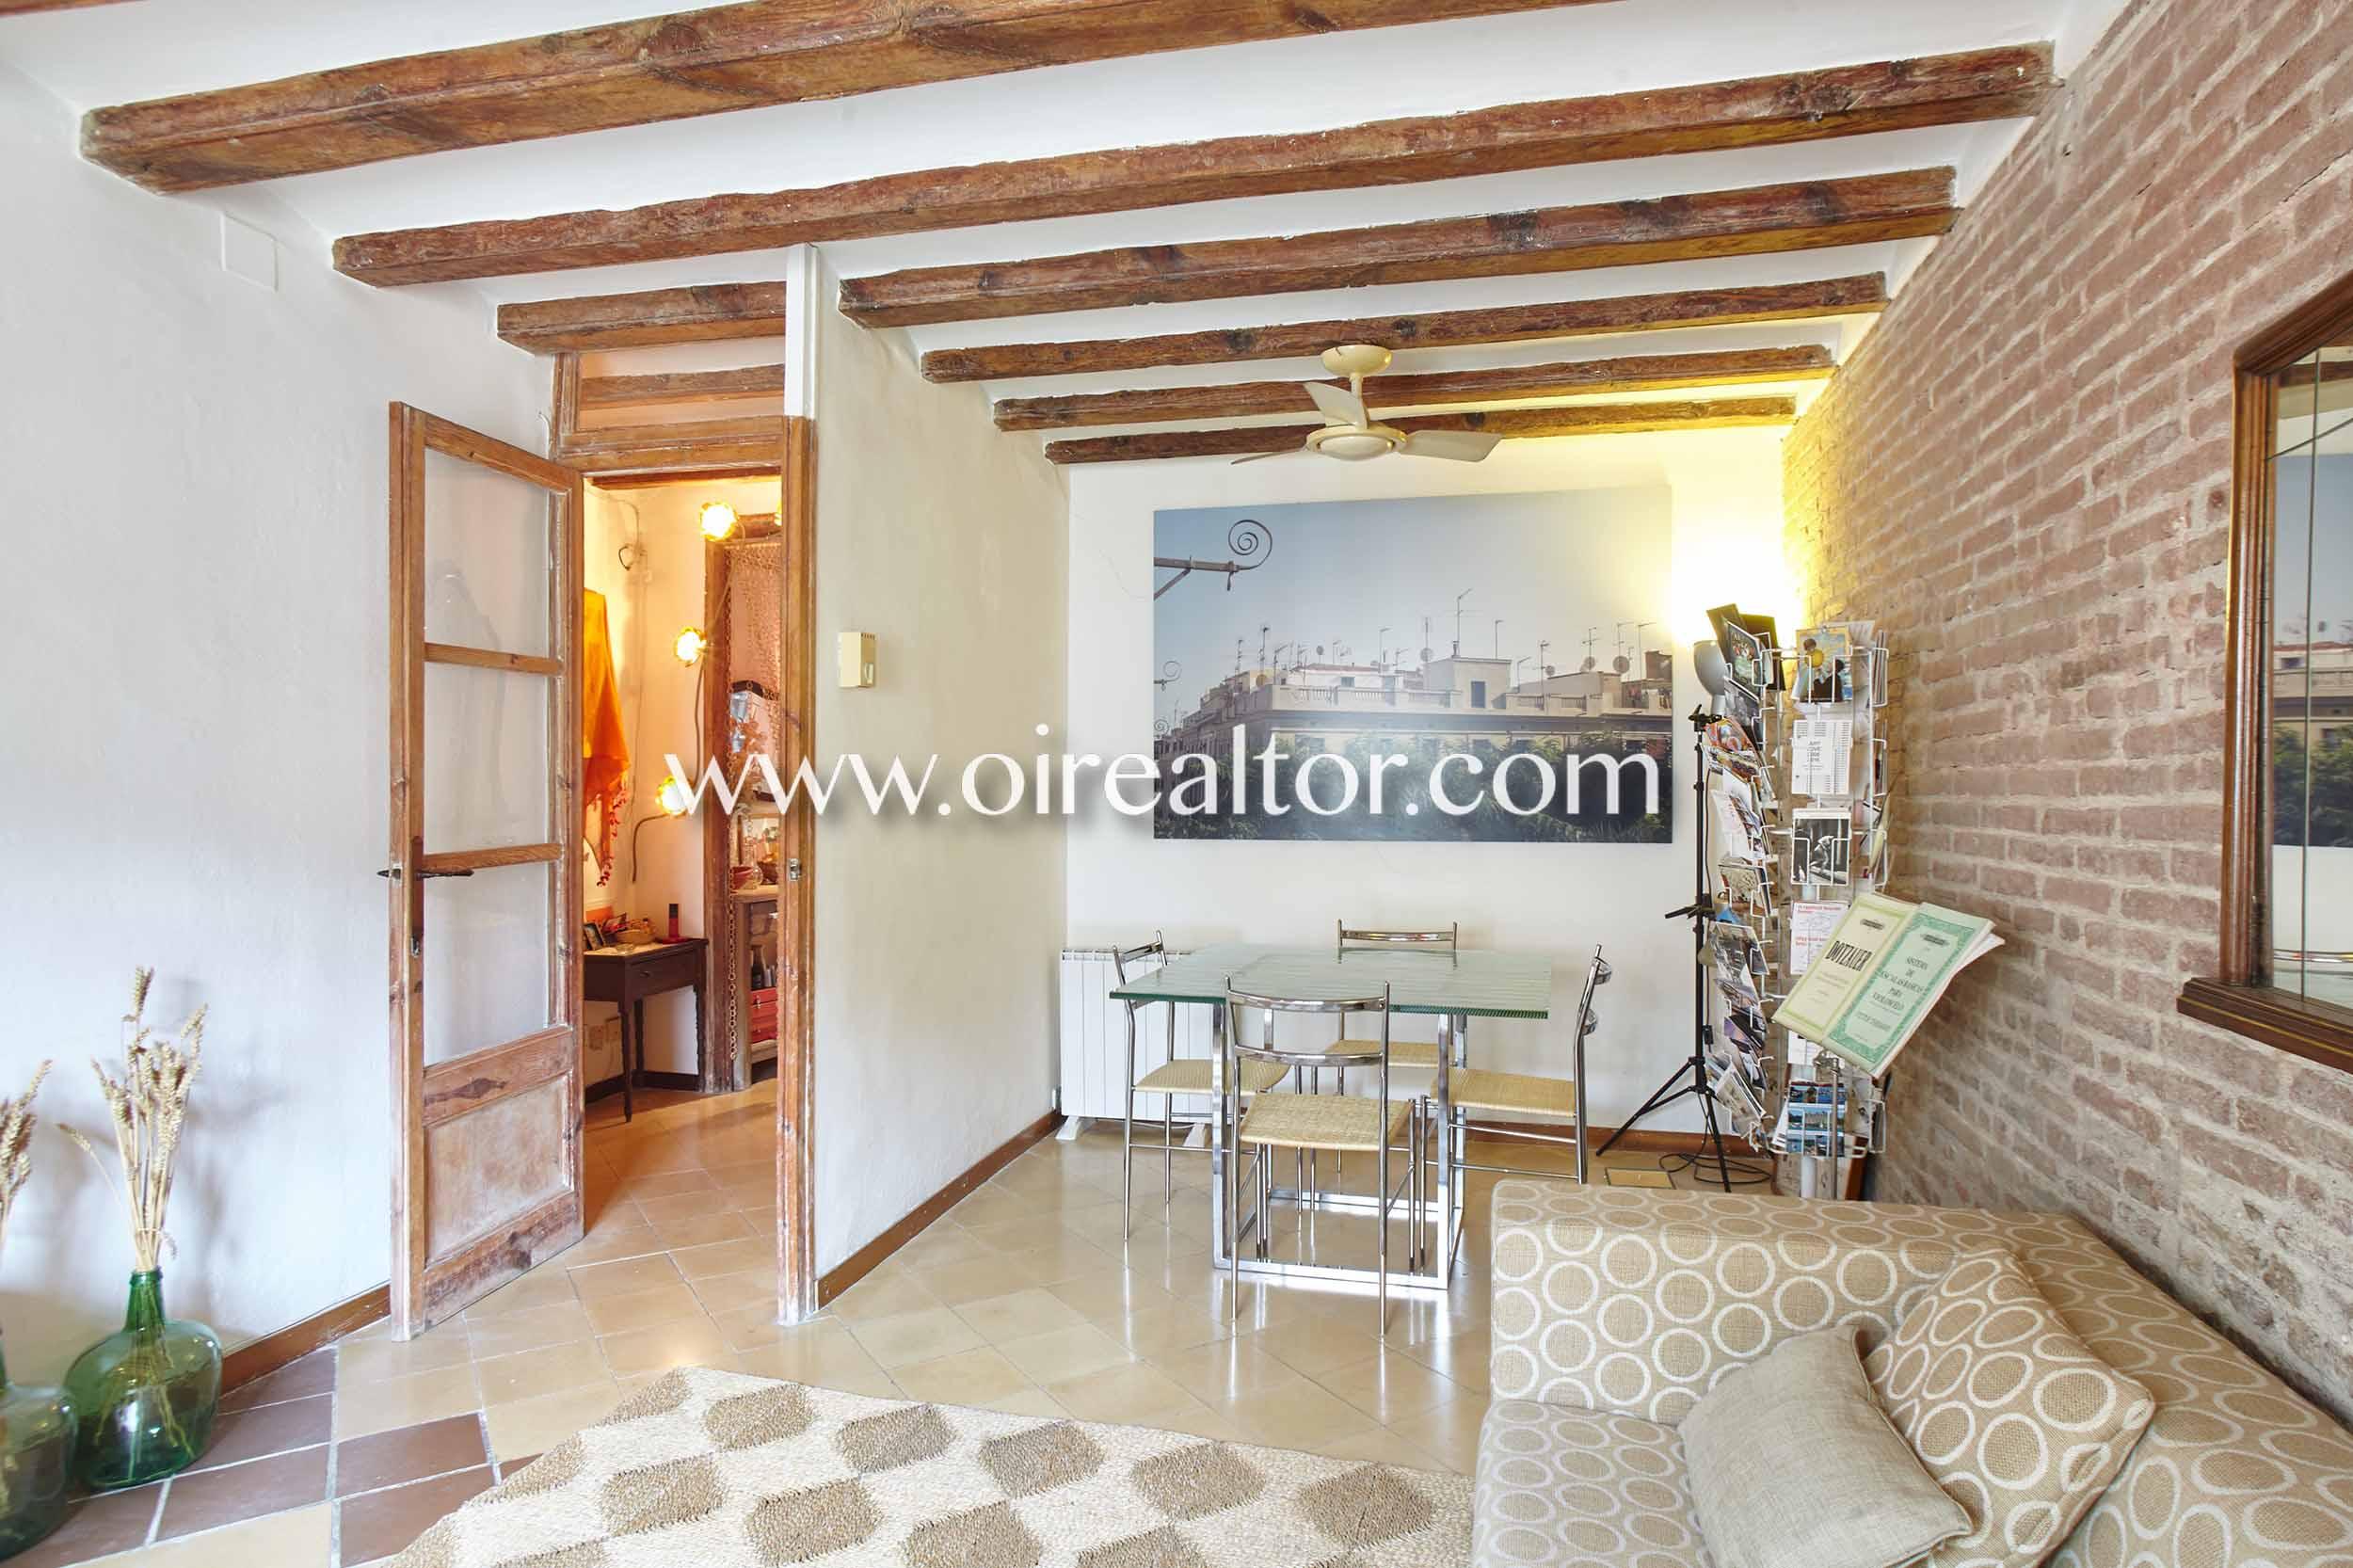 Magnifique appartement vendre tr s pr s de pla a - Placa universitat barcelona ...